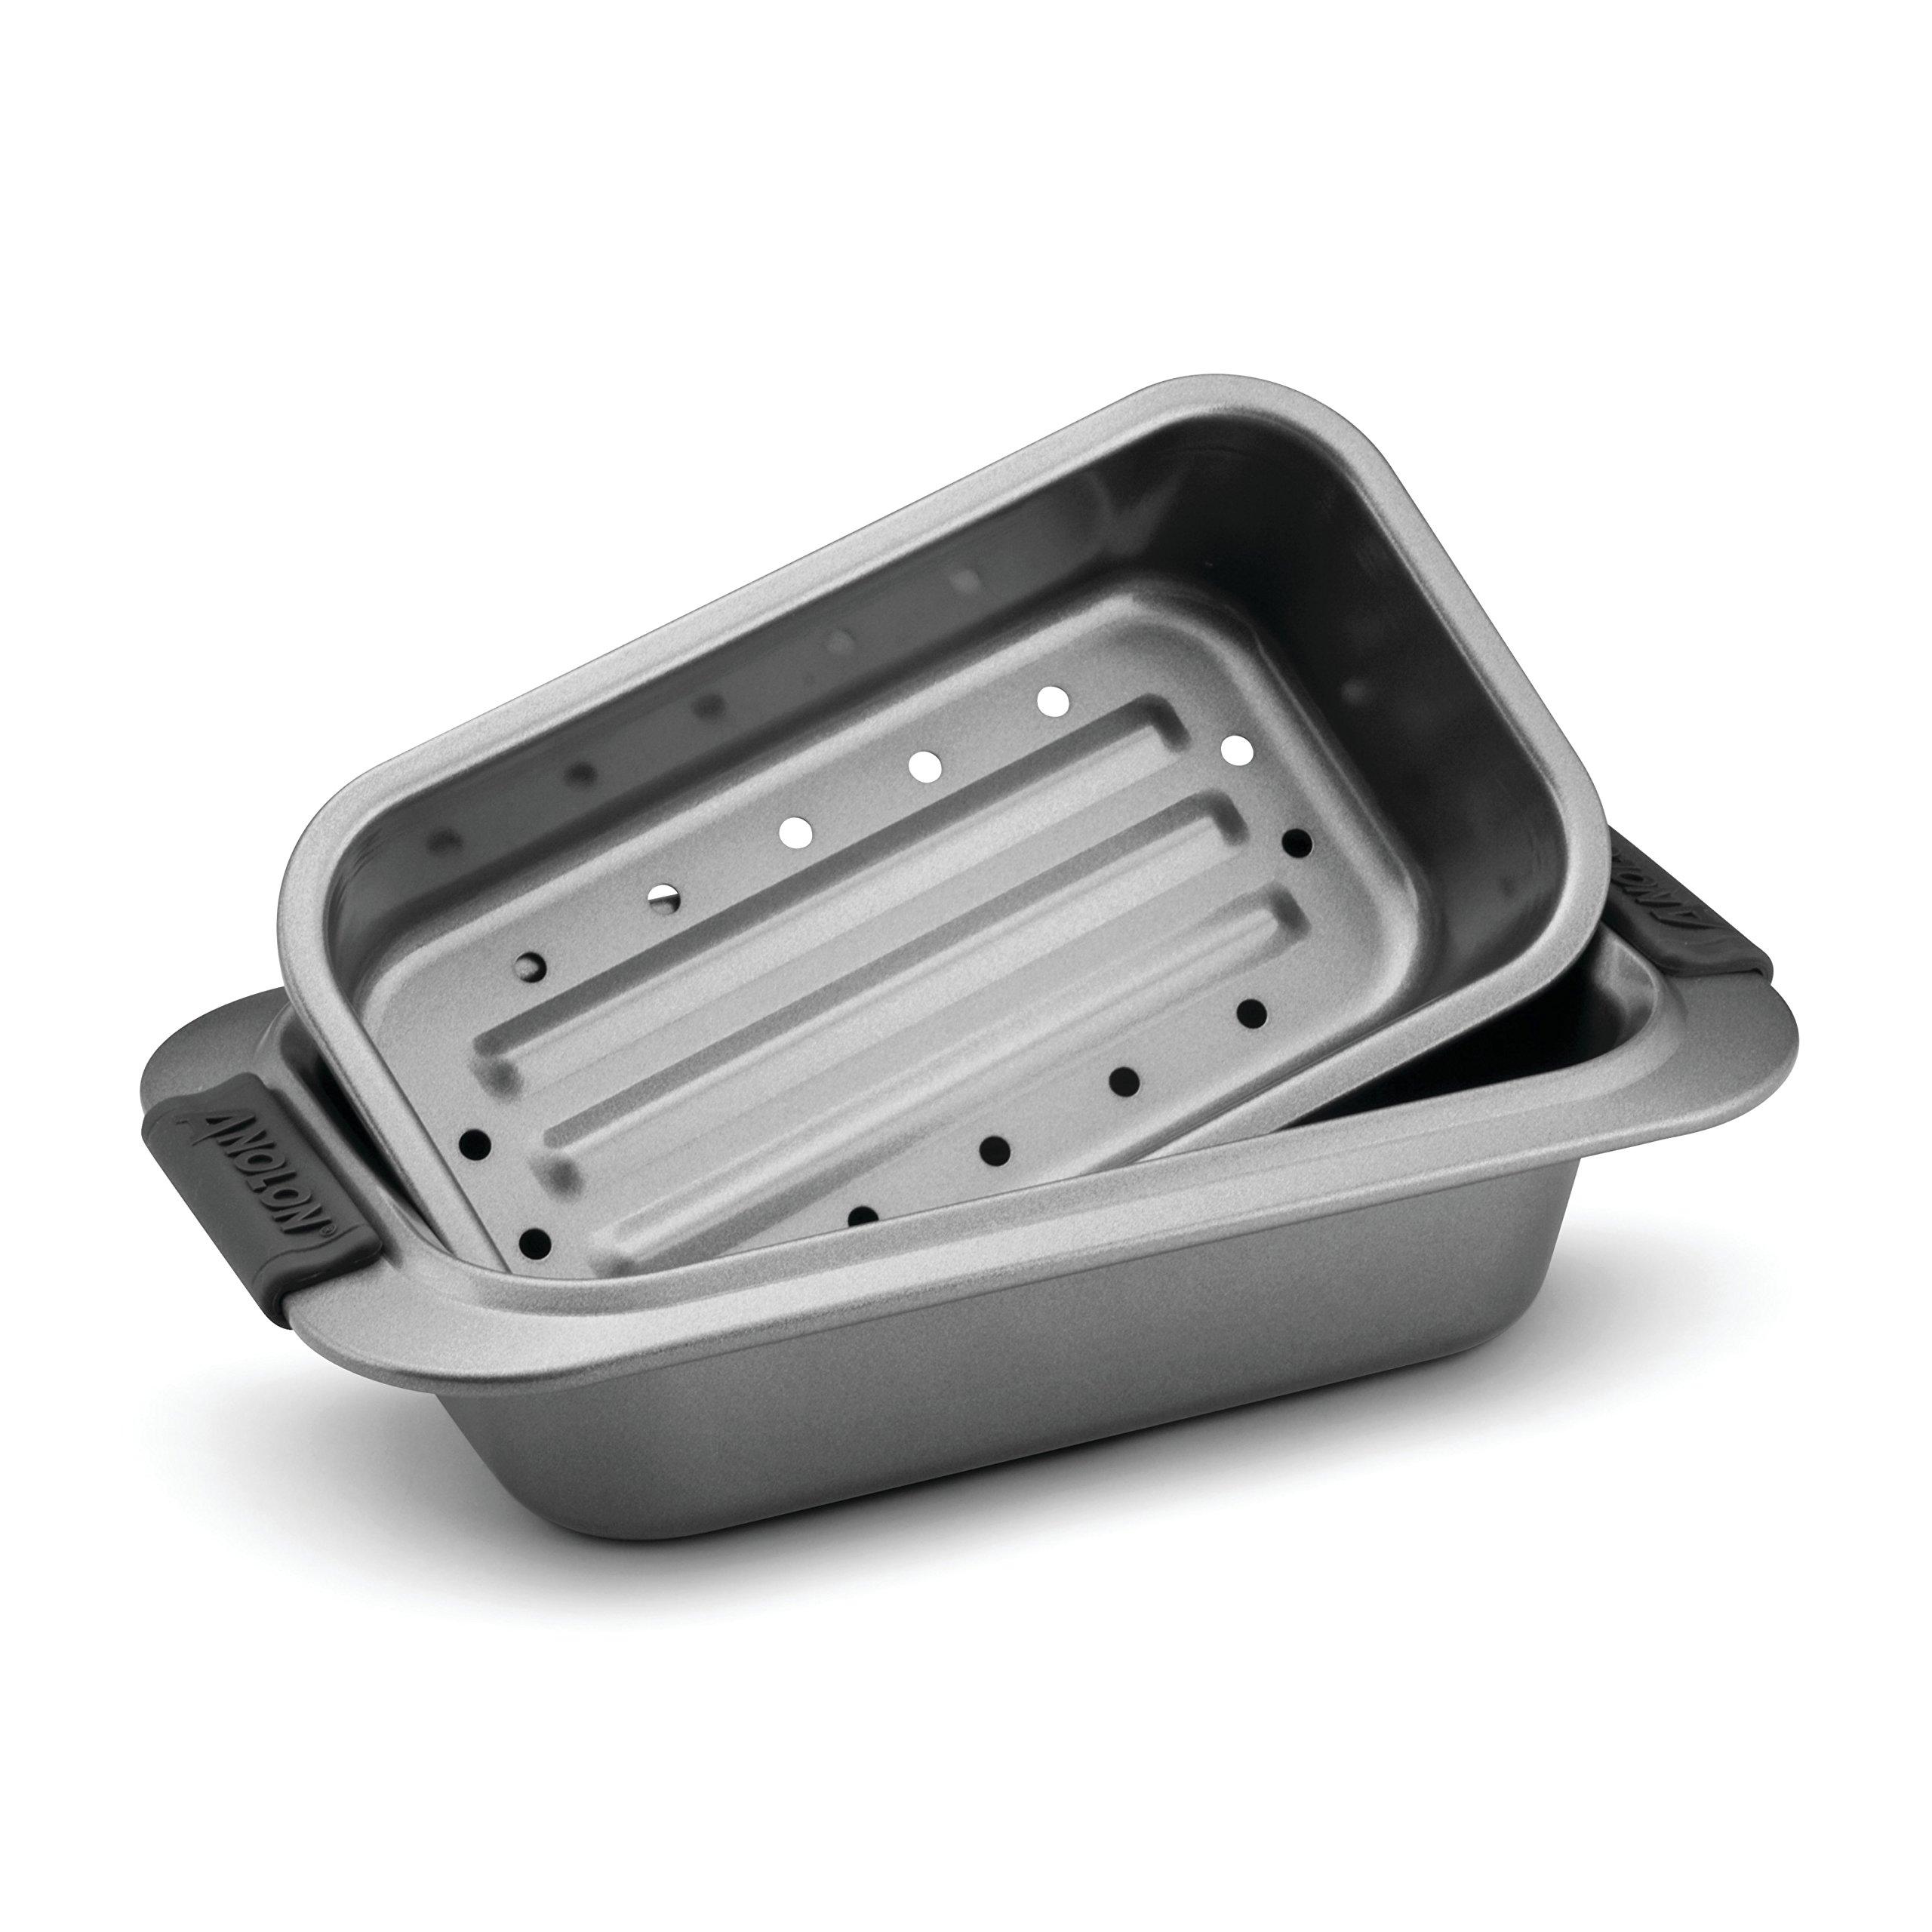 Anolon Advanced Nonstick Bakeware 2-Piece Loaf Pan Set